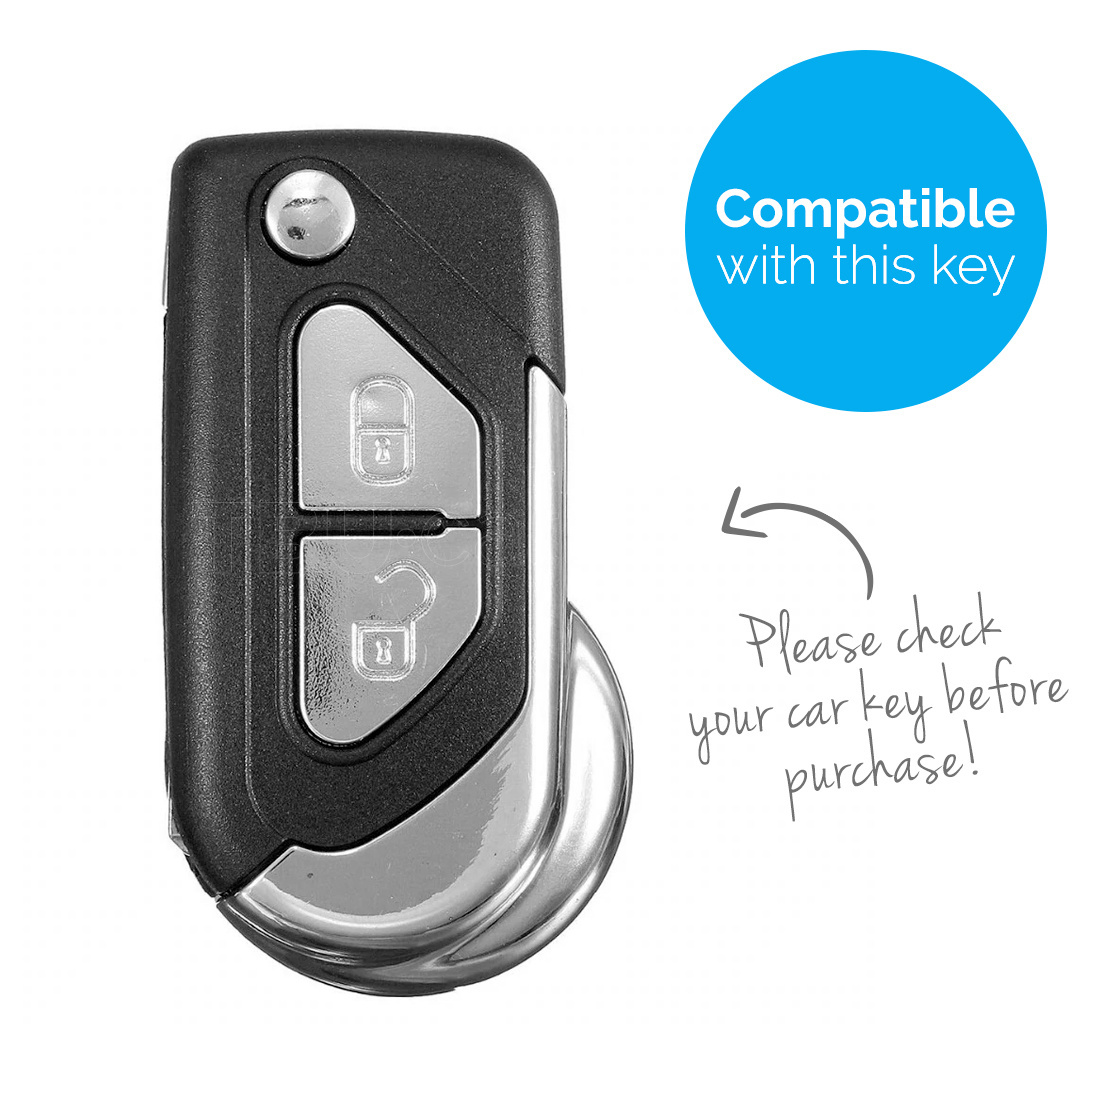 TBU car Autoschlüssel Hülle für Citroën 2 Tasten - Schutzhülle aus Silikon - Auto Schlüsselhülle Cover in Blau